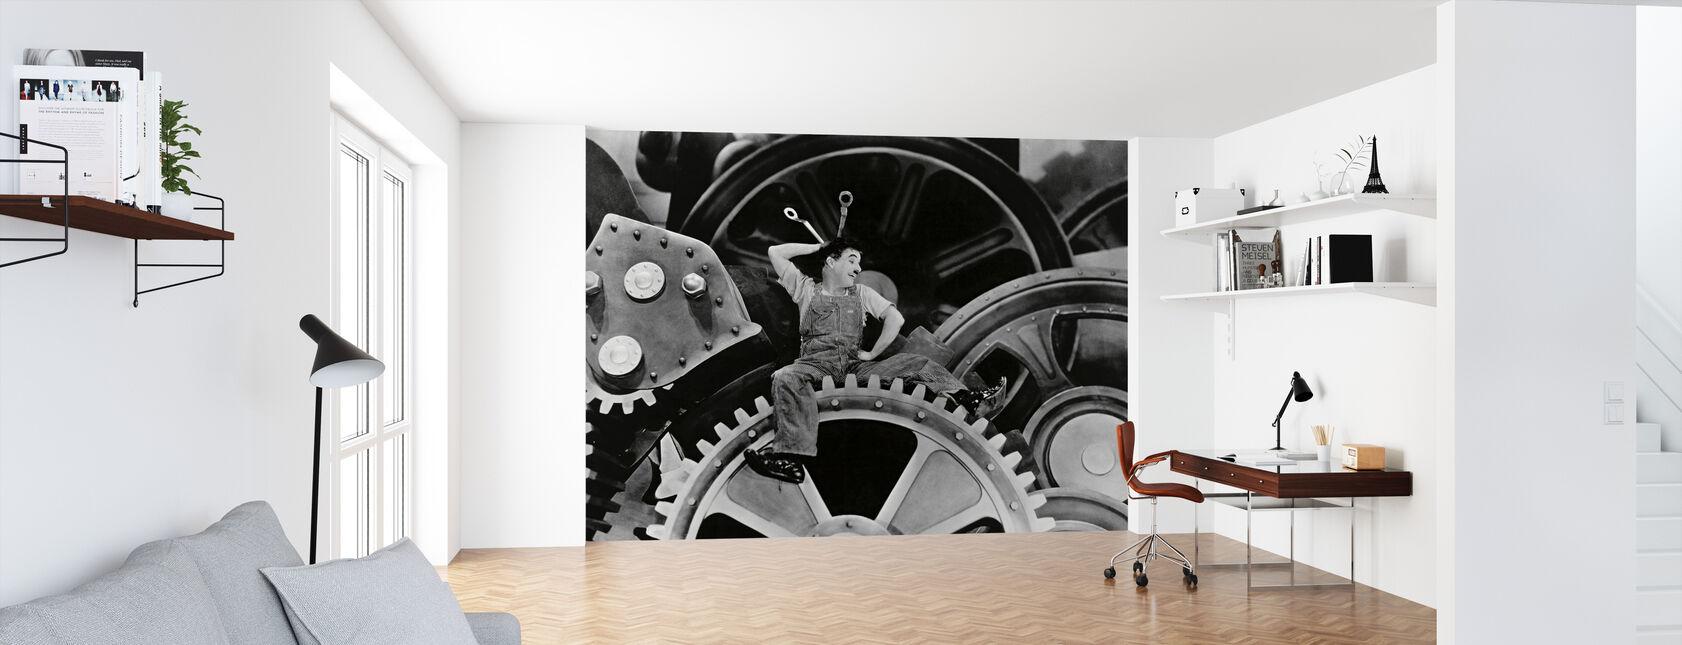 Charlie Chaplin in Modern Times - Wallpaper - Office